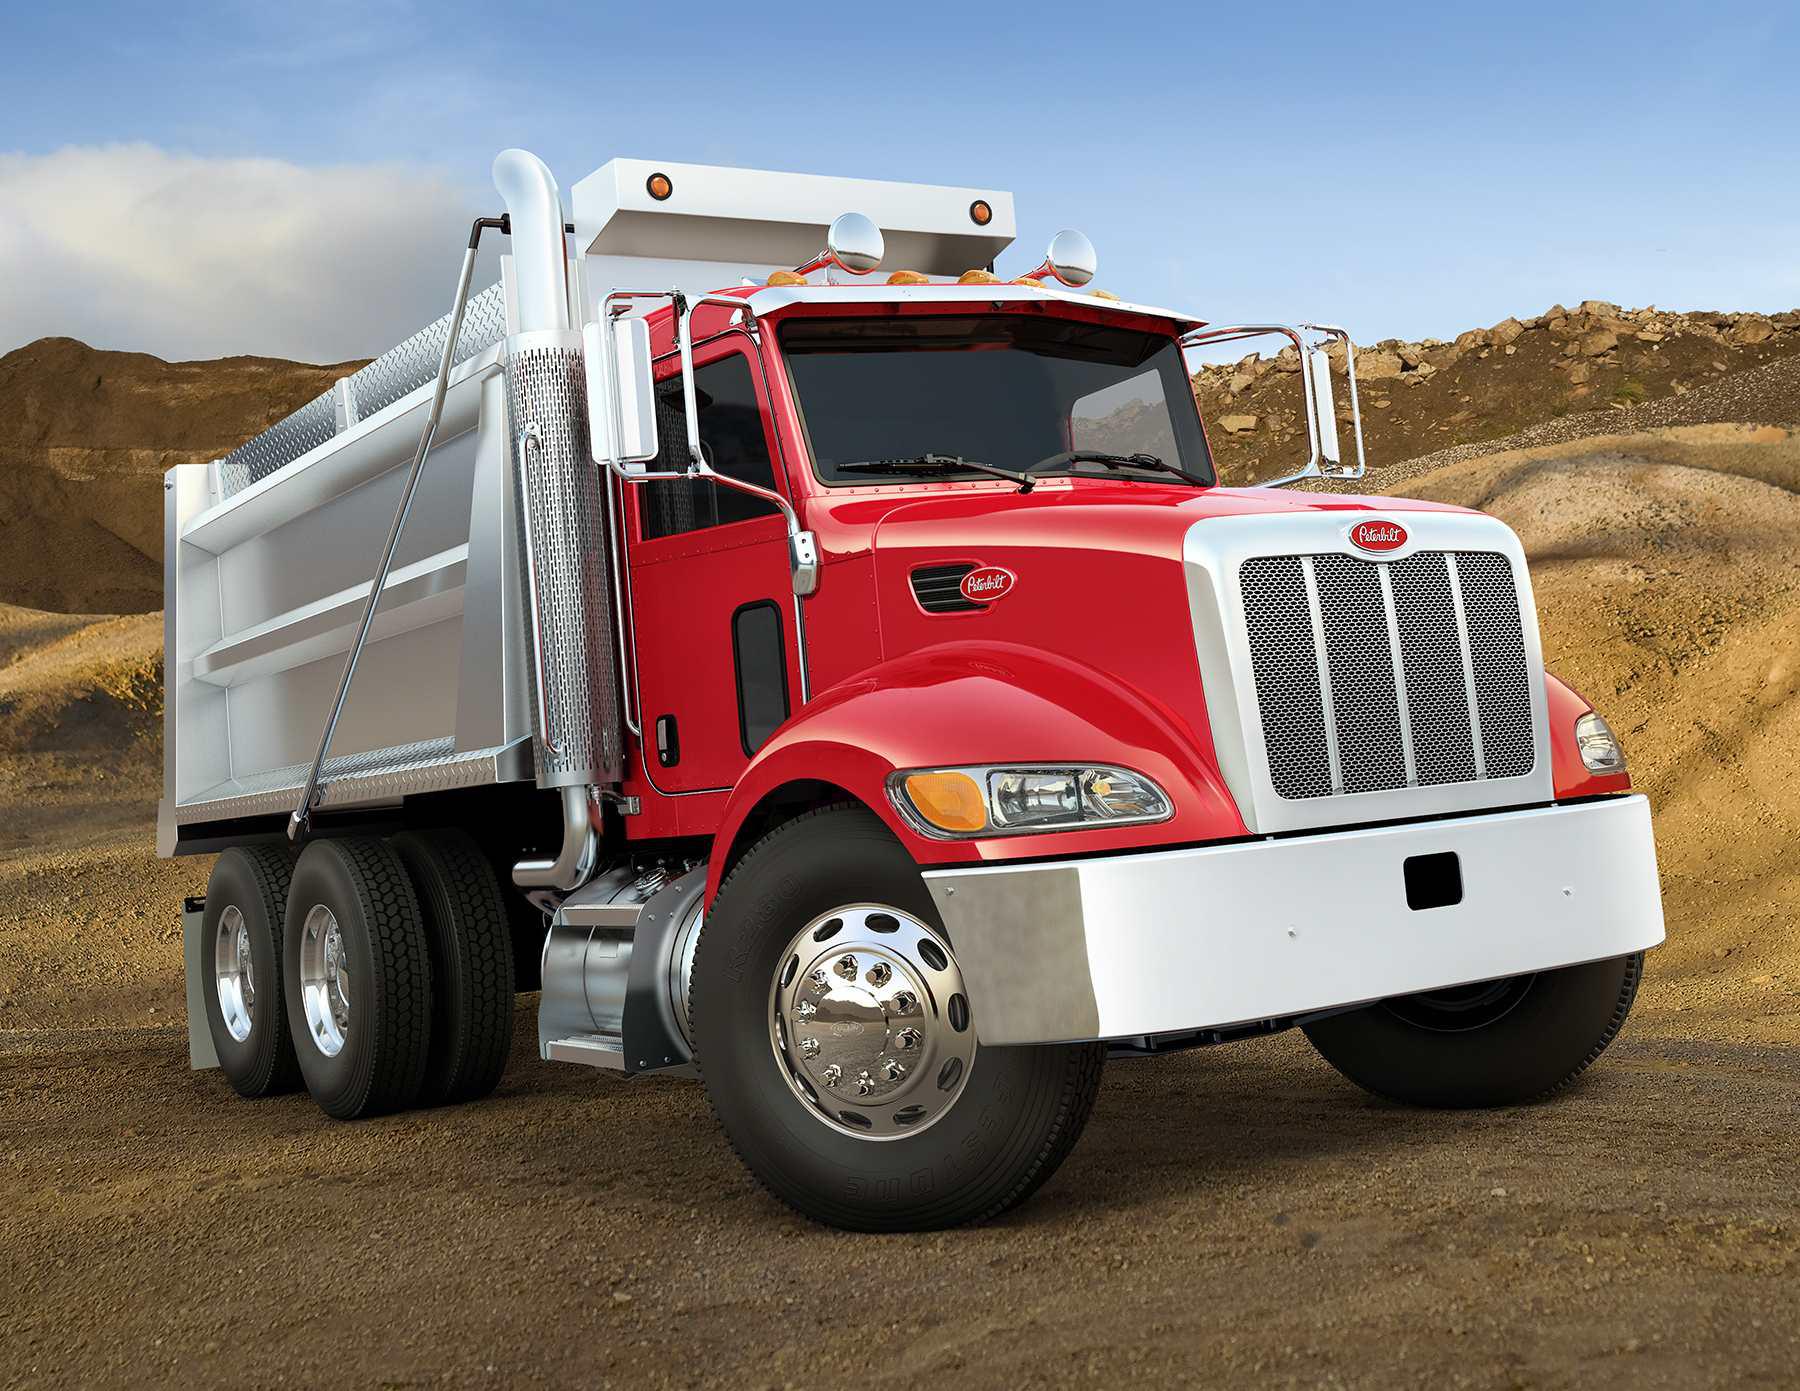 Peterbilt adding Bendix collision mitigation system to